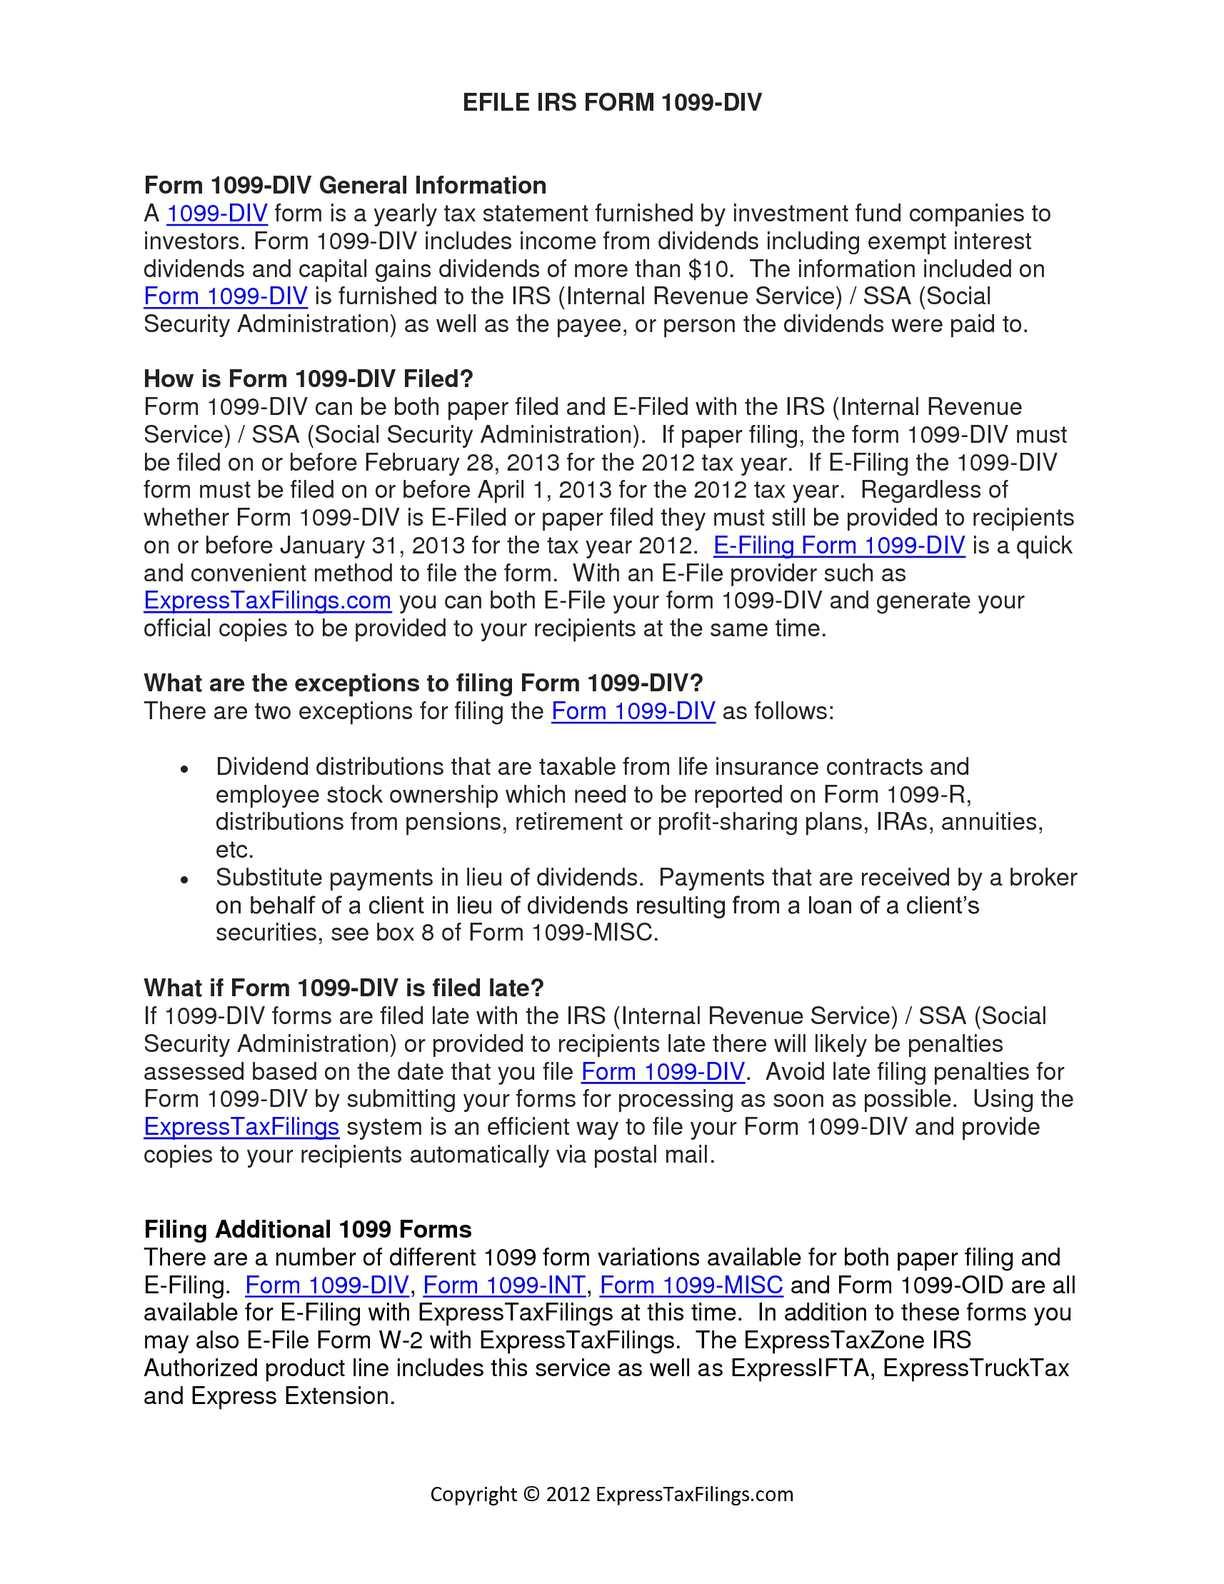 Calaméo - Efile 1099 DIV to IRS | Form 1099 DIV | Dividents